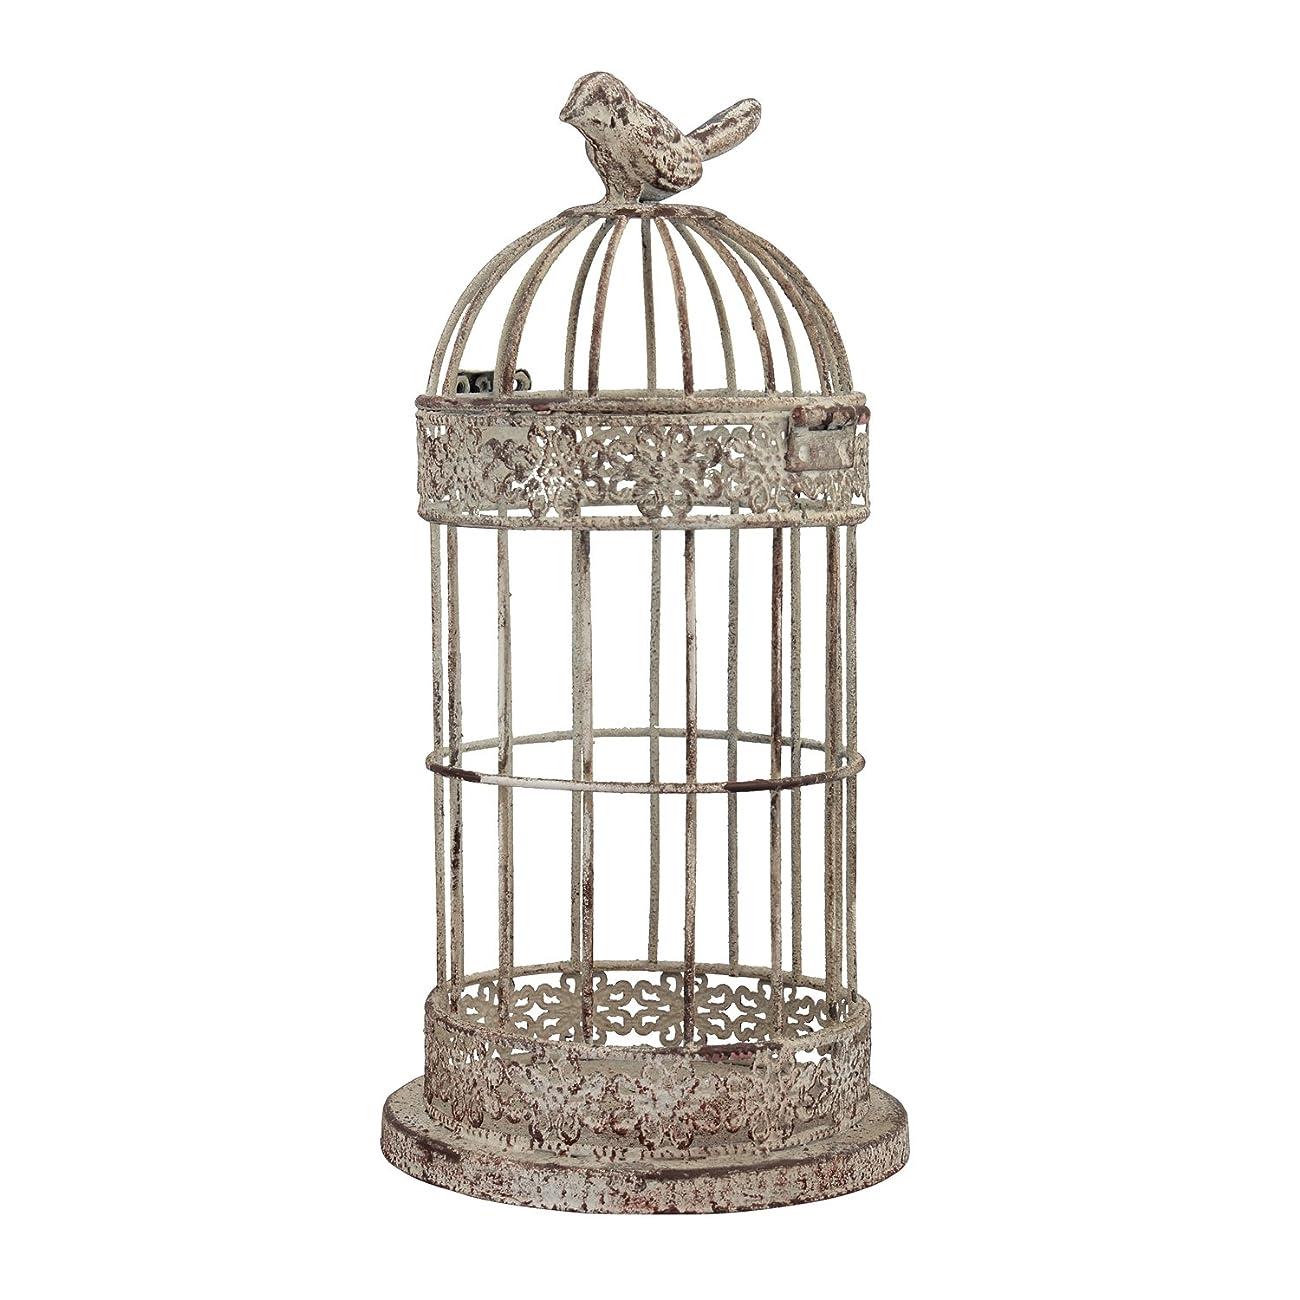 Stonebriar SB-5053A Small Aged Wire Bird Cage 0